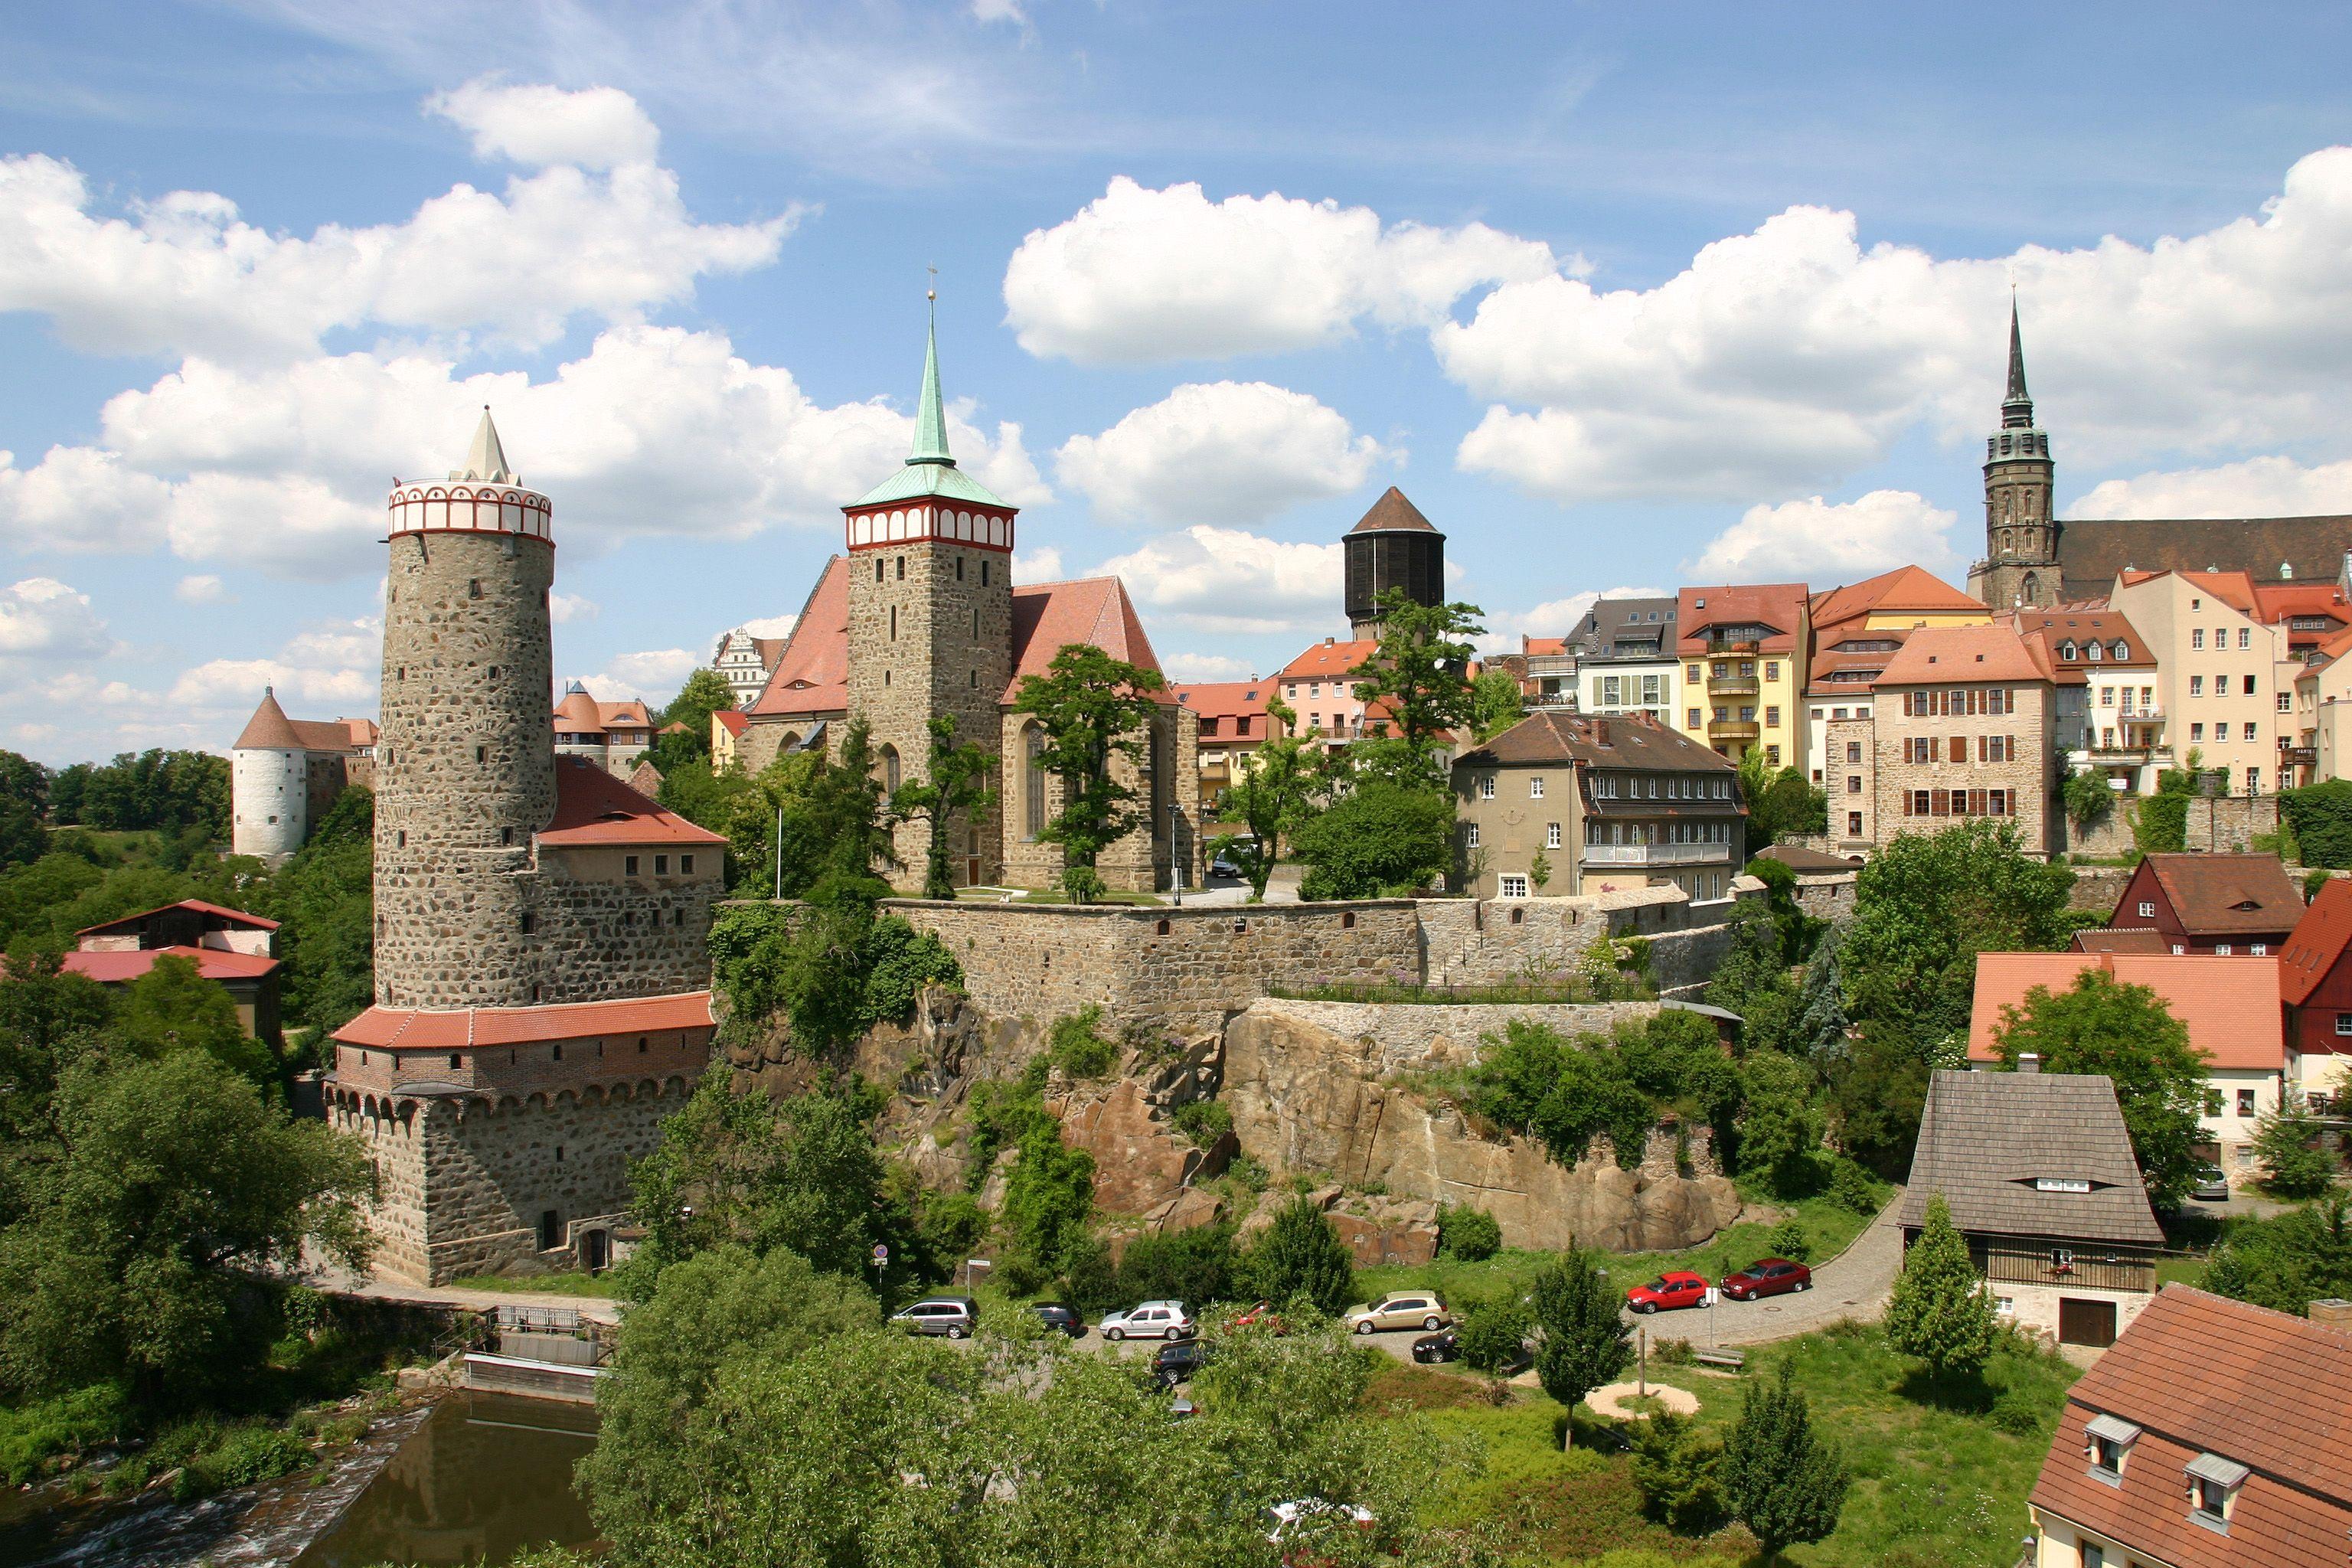 Altstadt Bautzen Kulturreise Reisen Ausflug